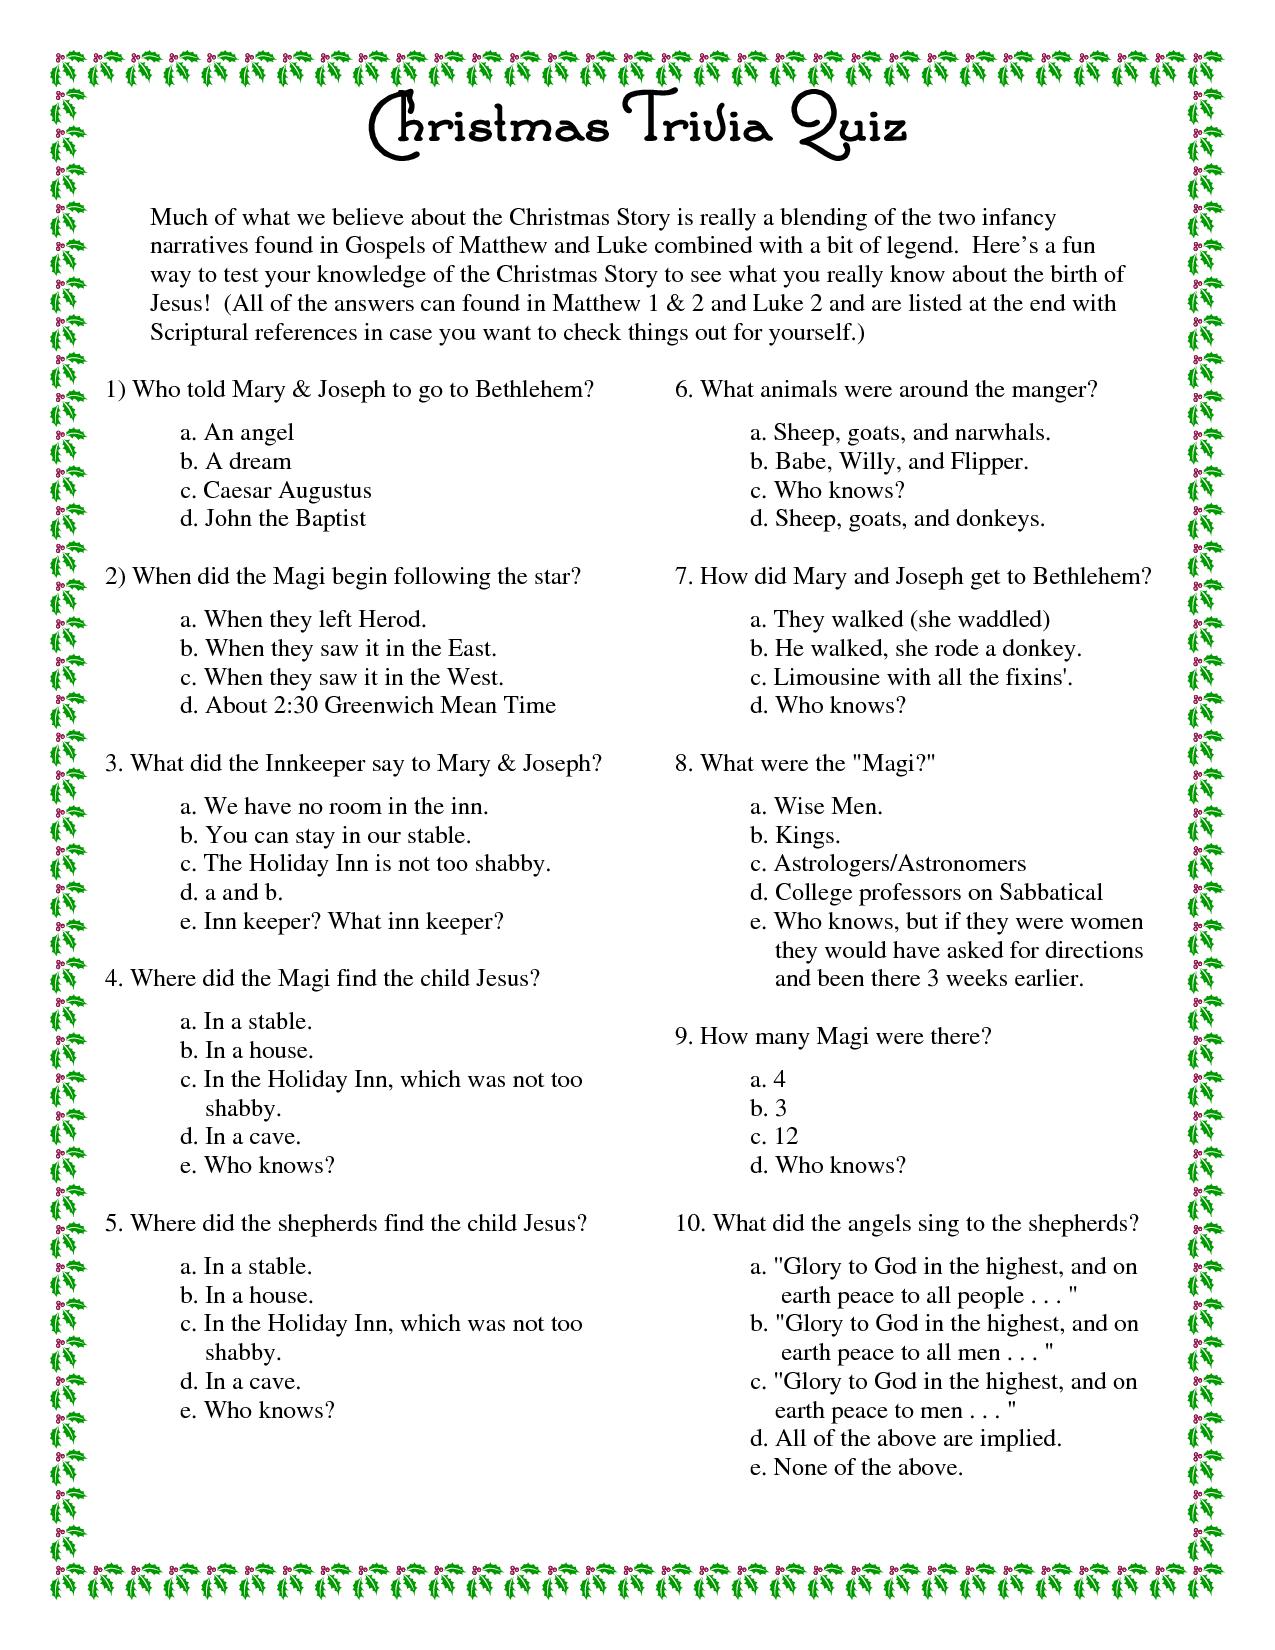 Printable Christmas Trivia Questions And Answers | Christmas Party - Free Printable Trivia Questions For Seniors